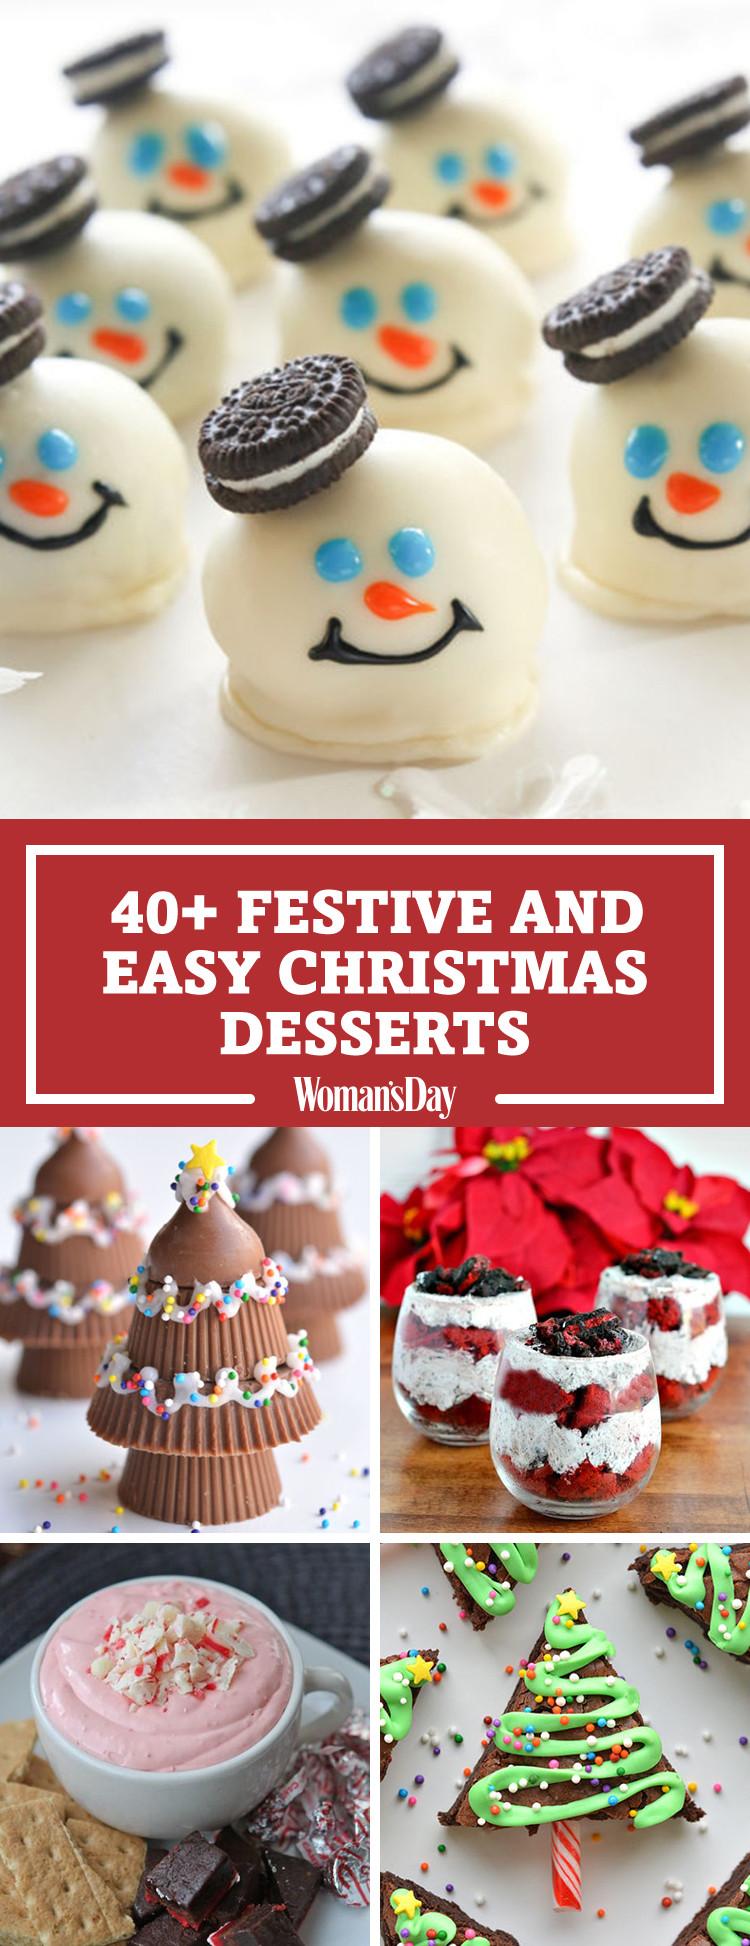 Easy Desserts For Christmas  57 Easy Christmas Dessert Recipes Best Ideas for Fun